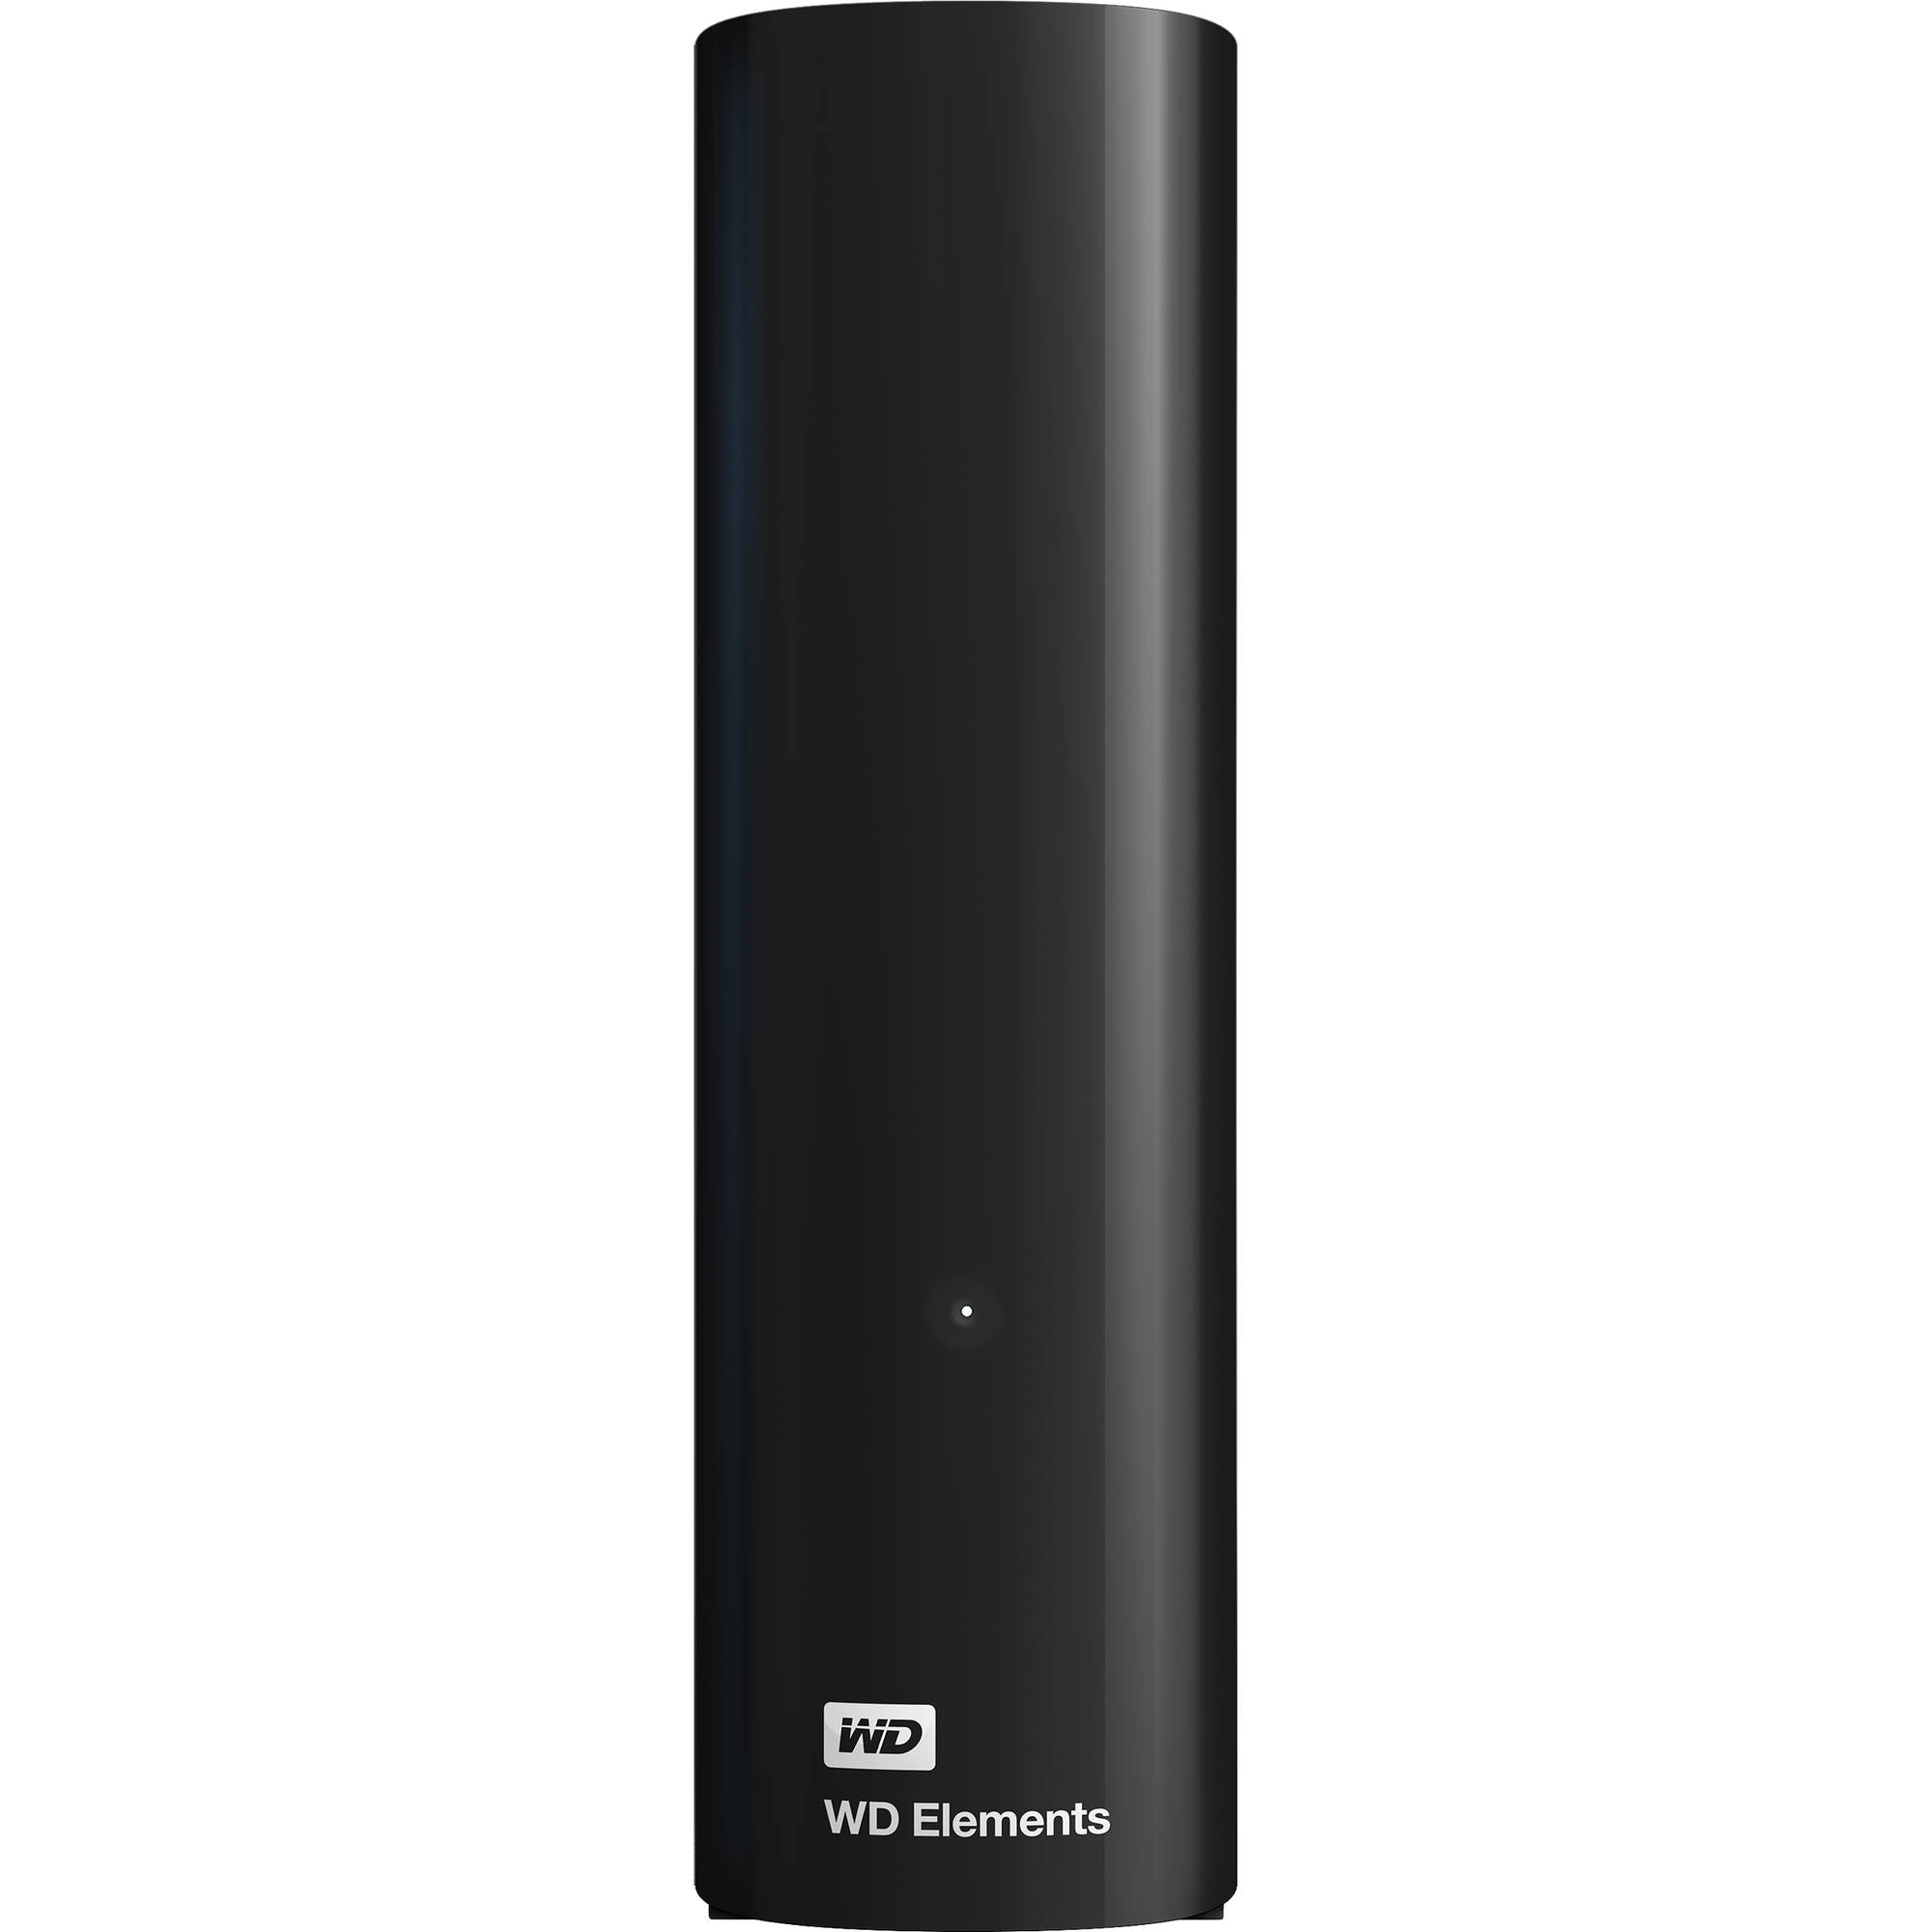 WD Elements 8TB USB 3.0 Desktop Hard Drive WDBWLG0080HBK-NESN Black